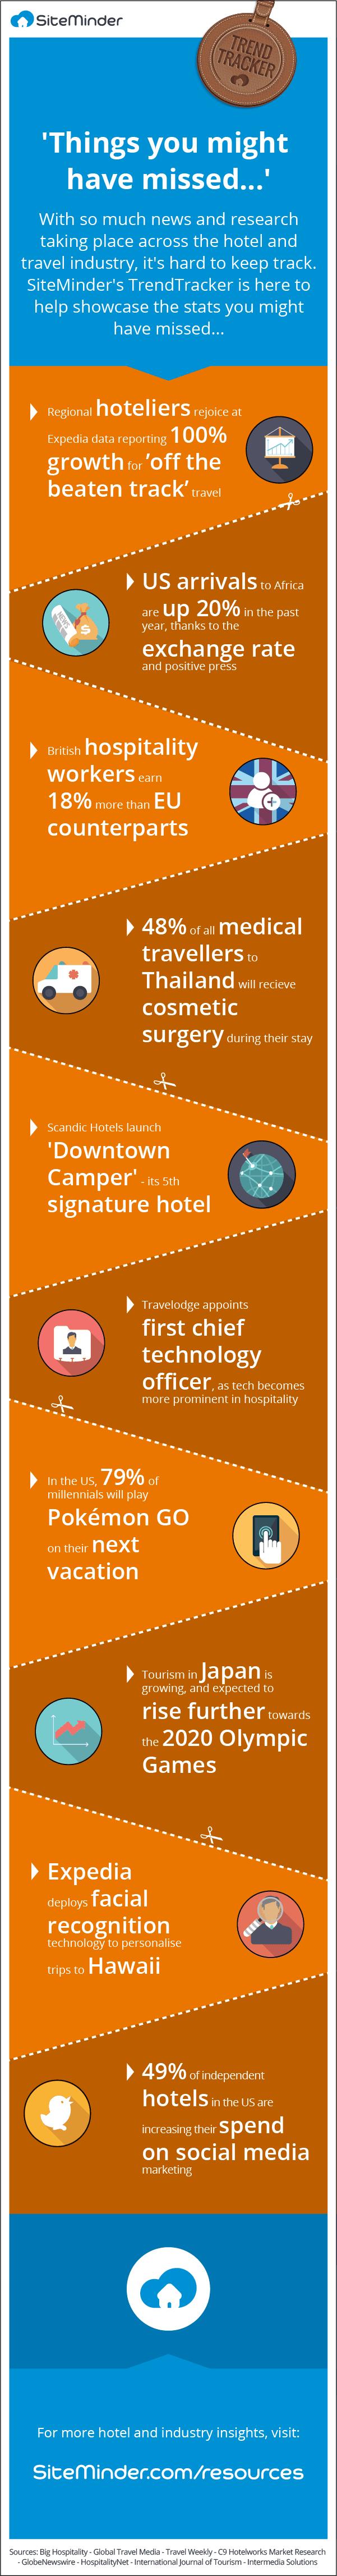 things customer wants in hotel